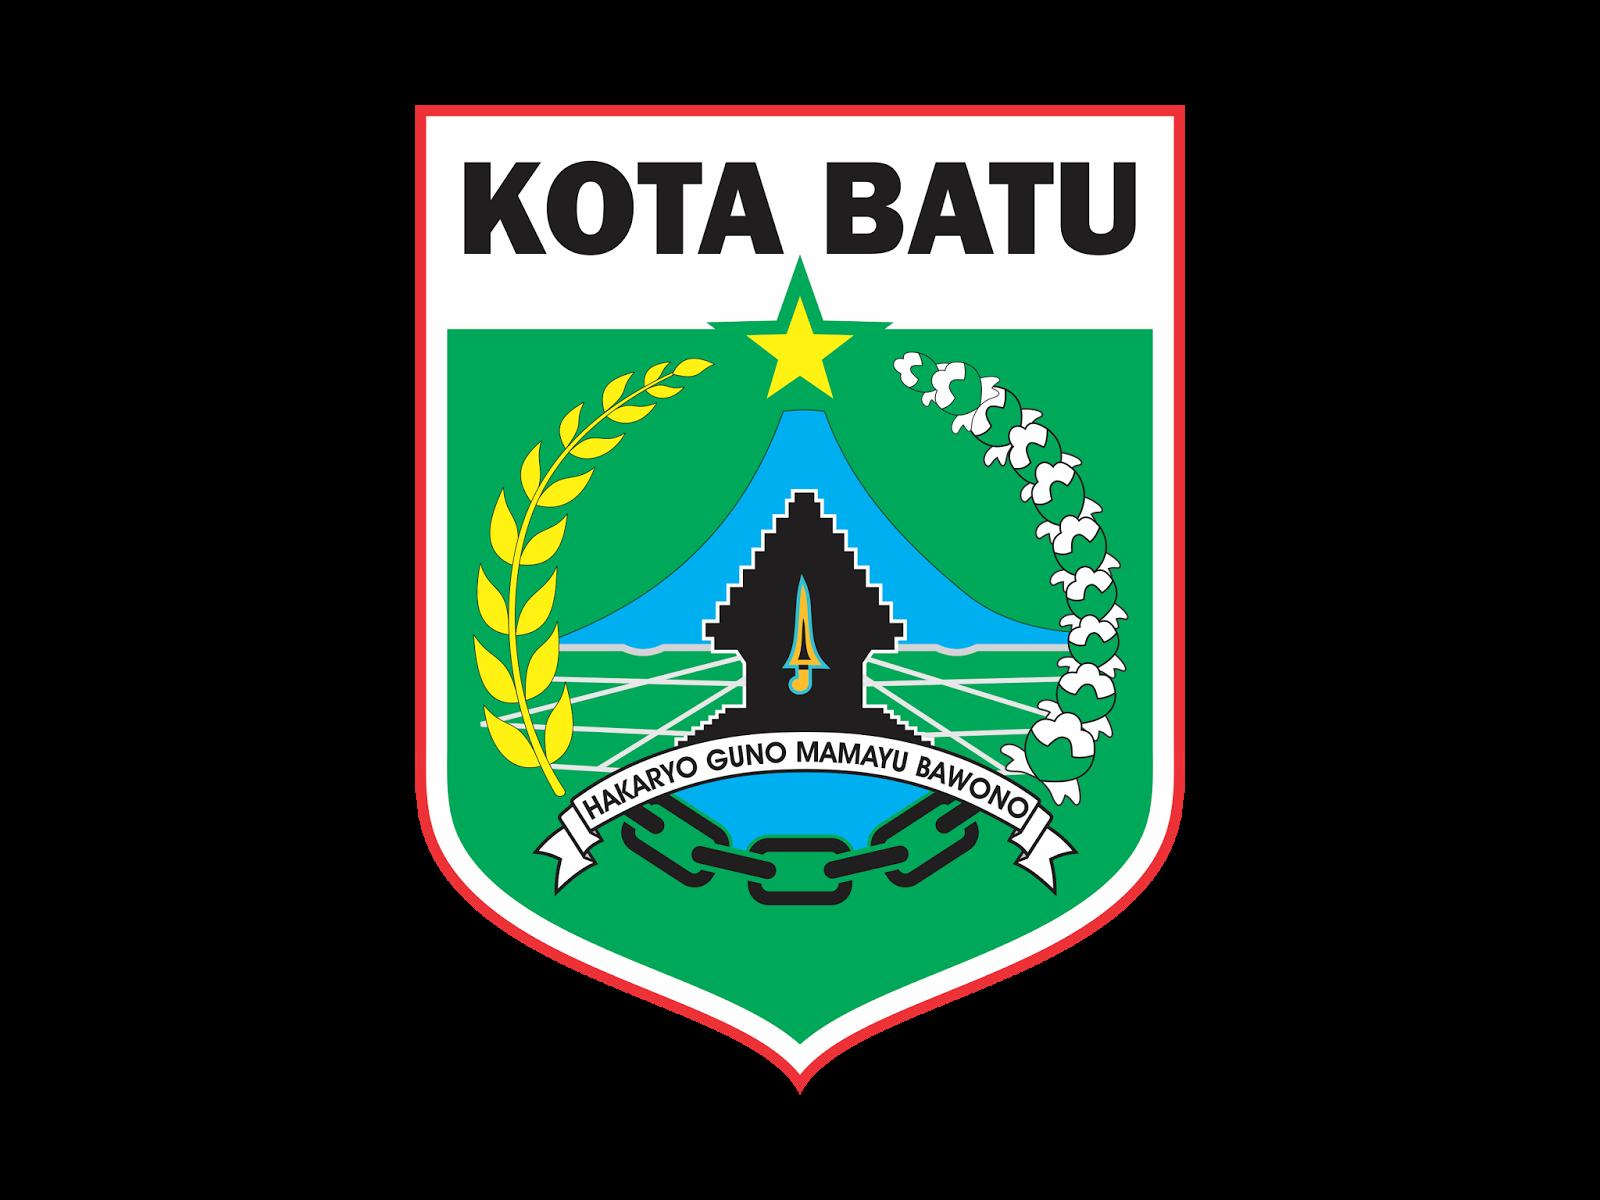 Warung Vector Logo Kota Batu Format Cdr Png Hd